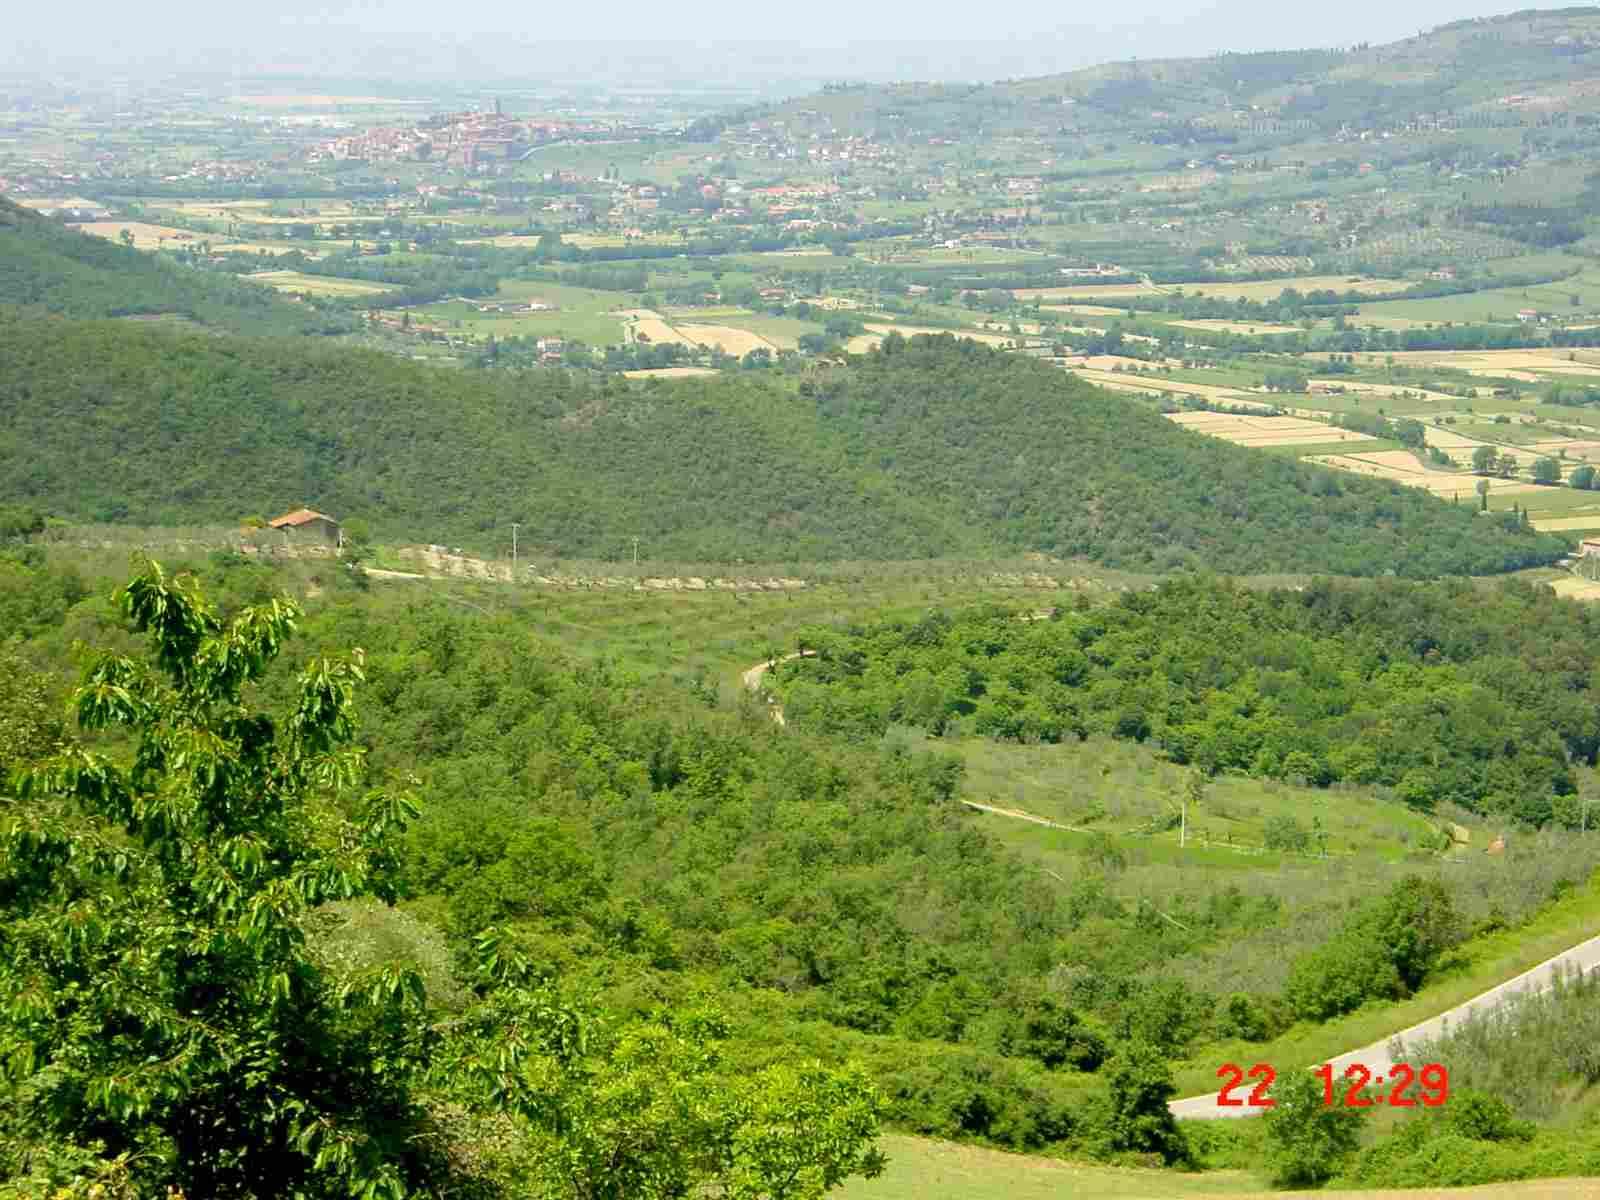 Foto 2 zur Tour: Monte Castel Giudeo, 1037 m